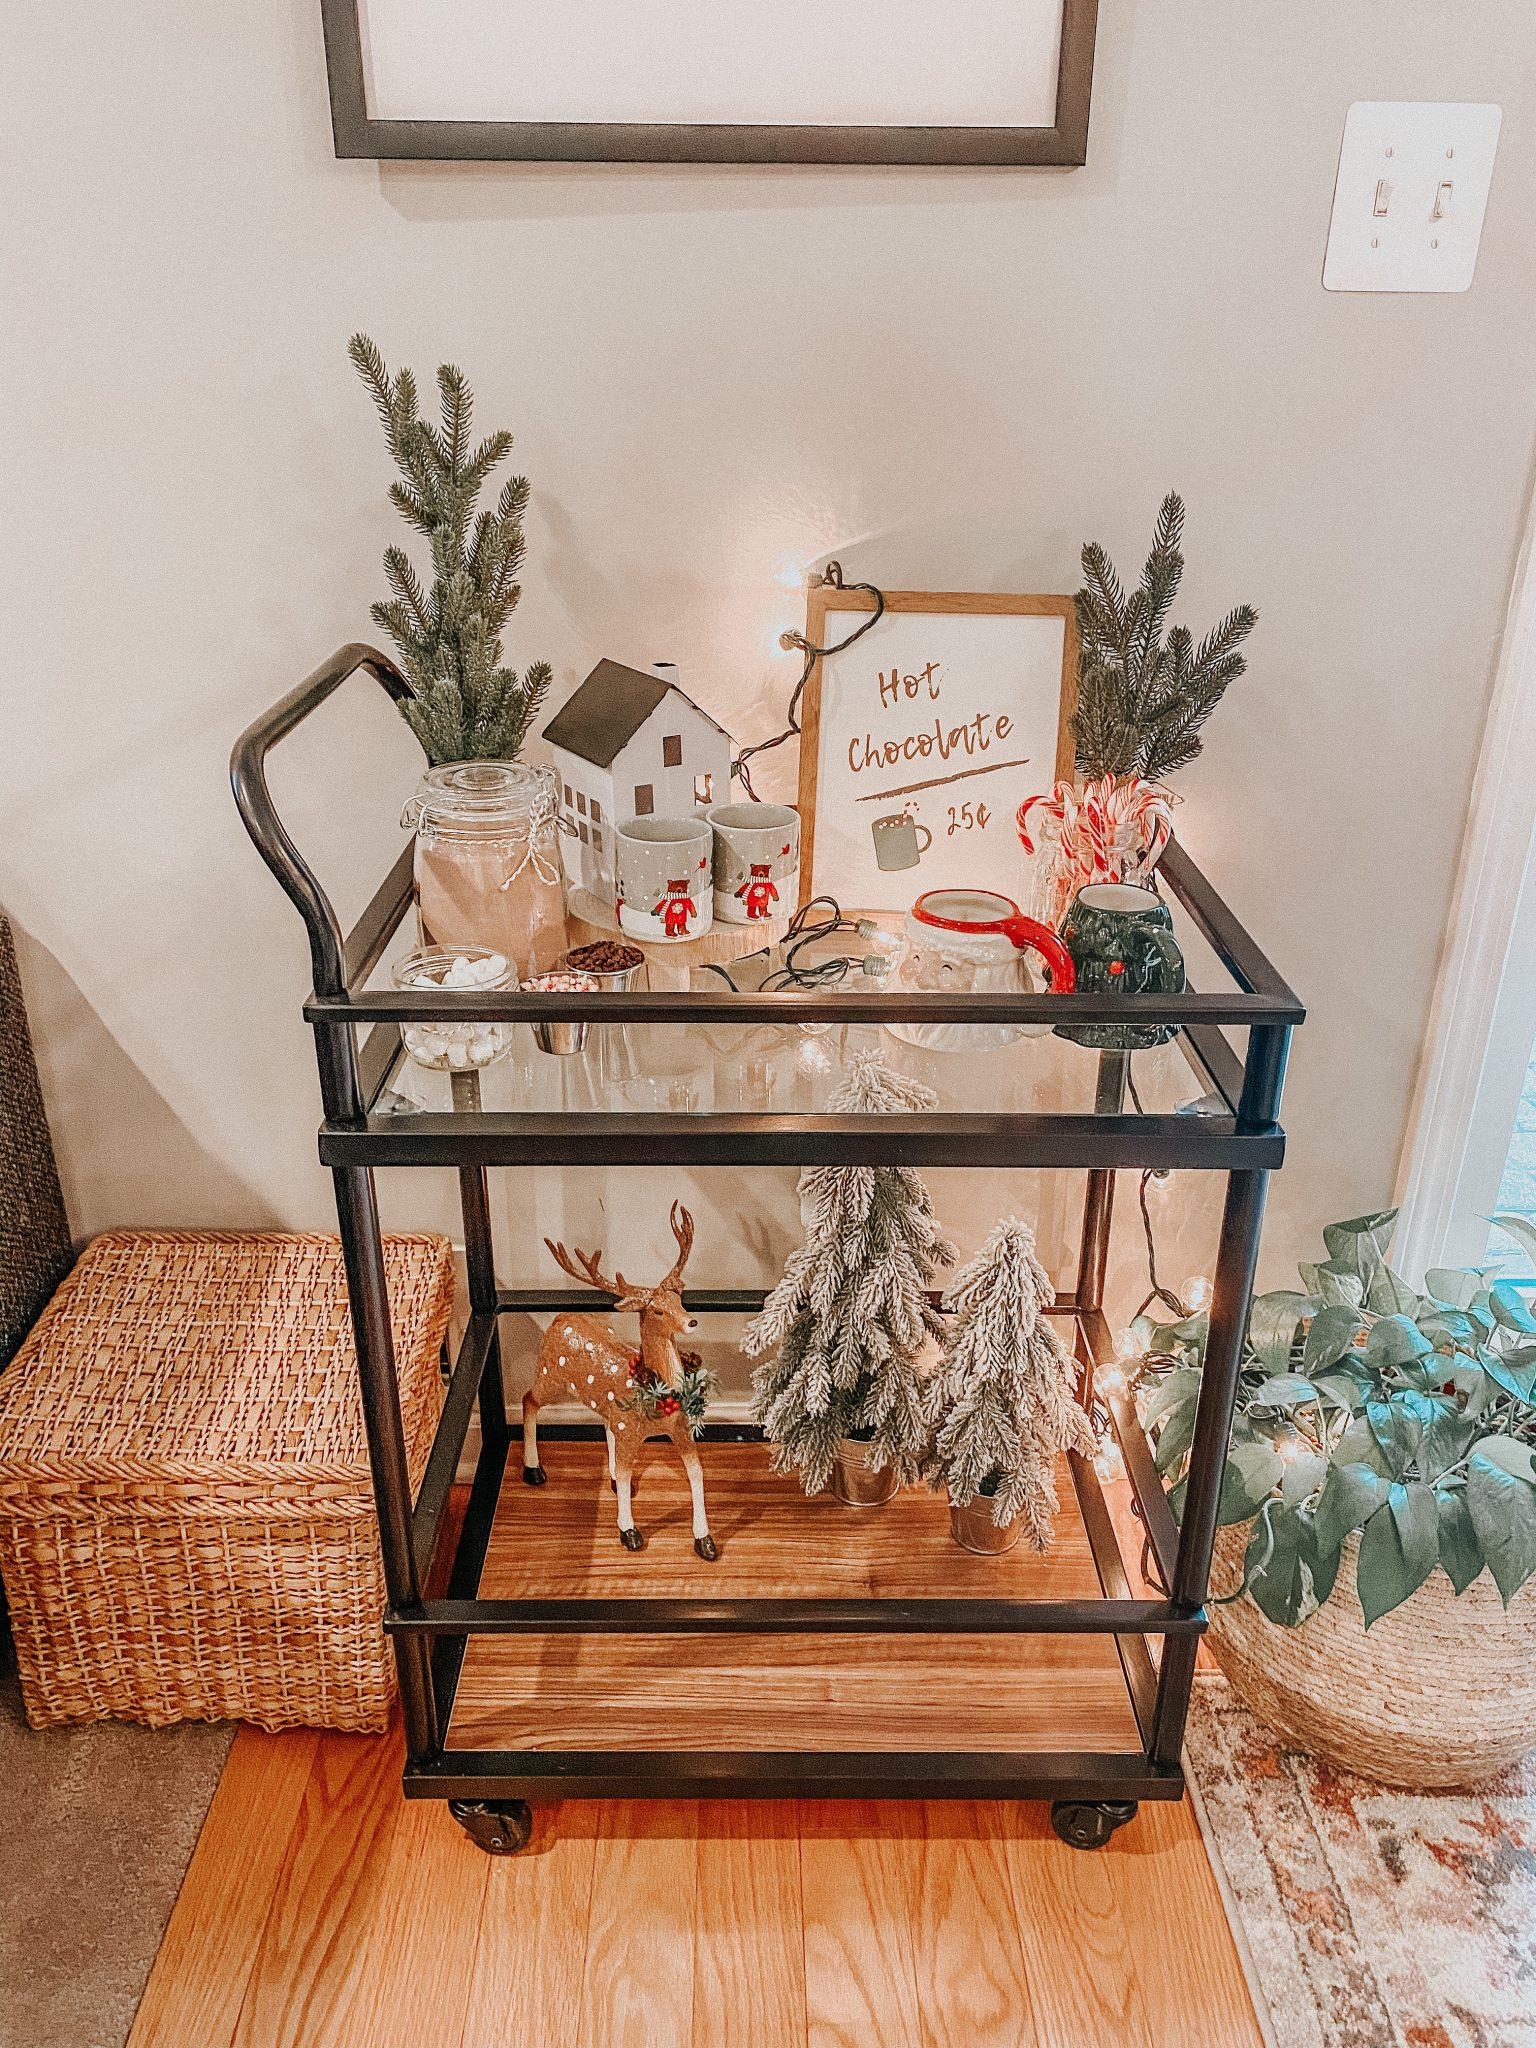 Christmas Home Tour | Daily Splendor Life and Style Blog | Christmas Dining Room #barcart #hotchocolatebar #kidschristmas